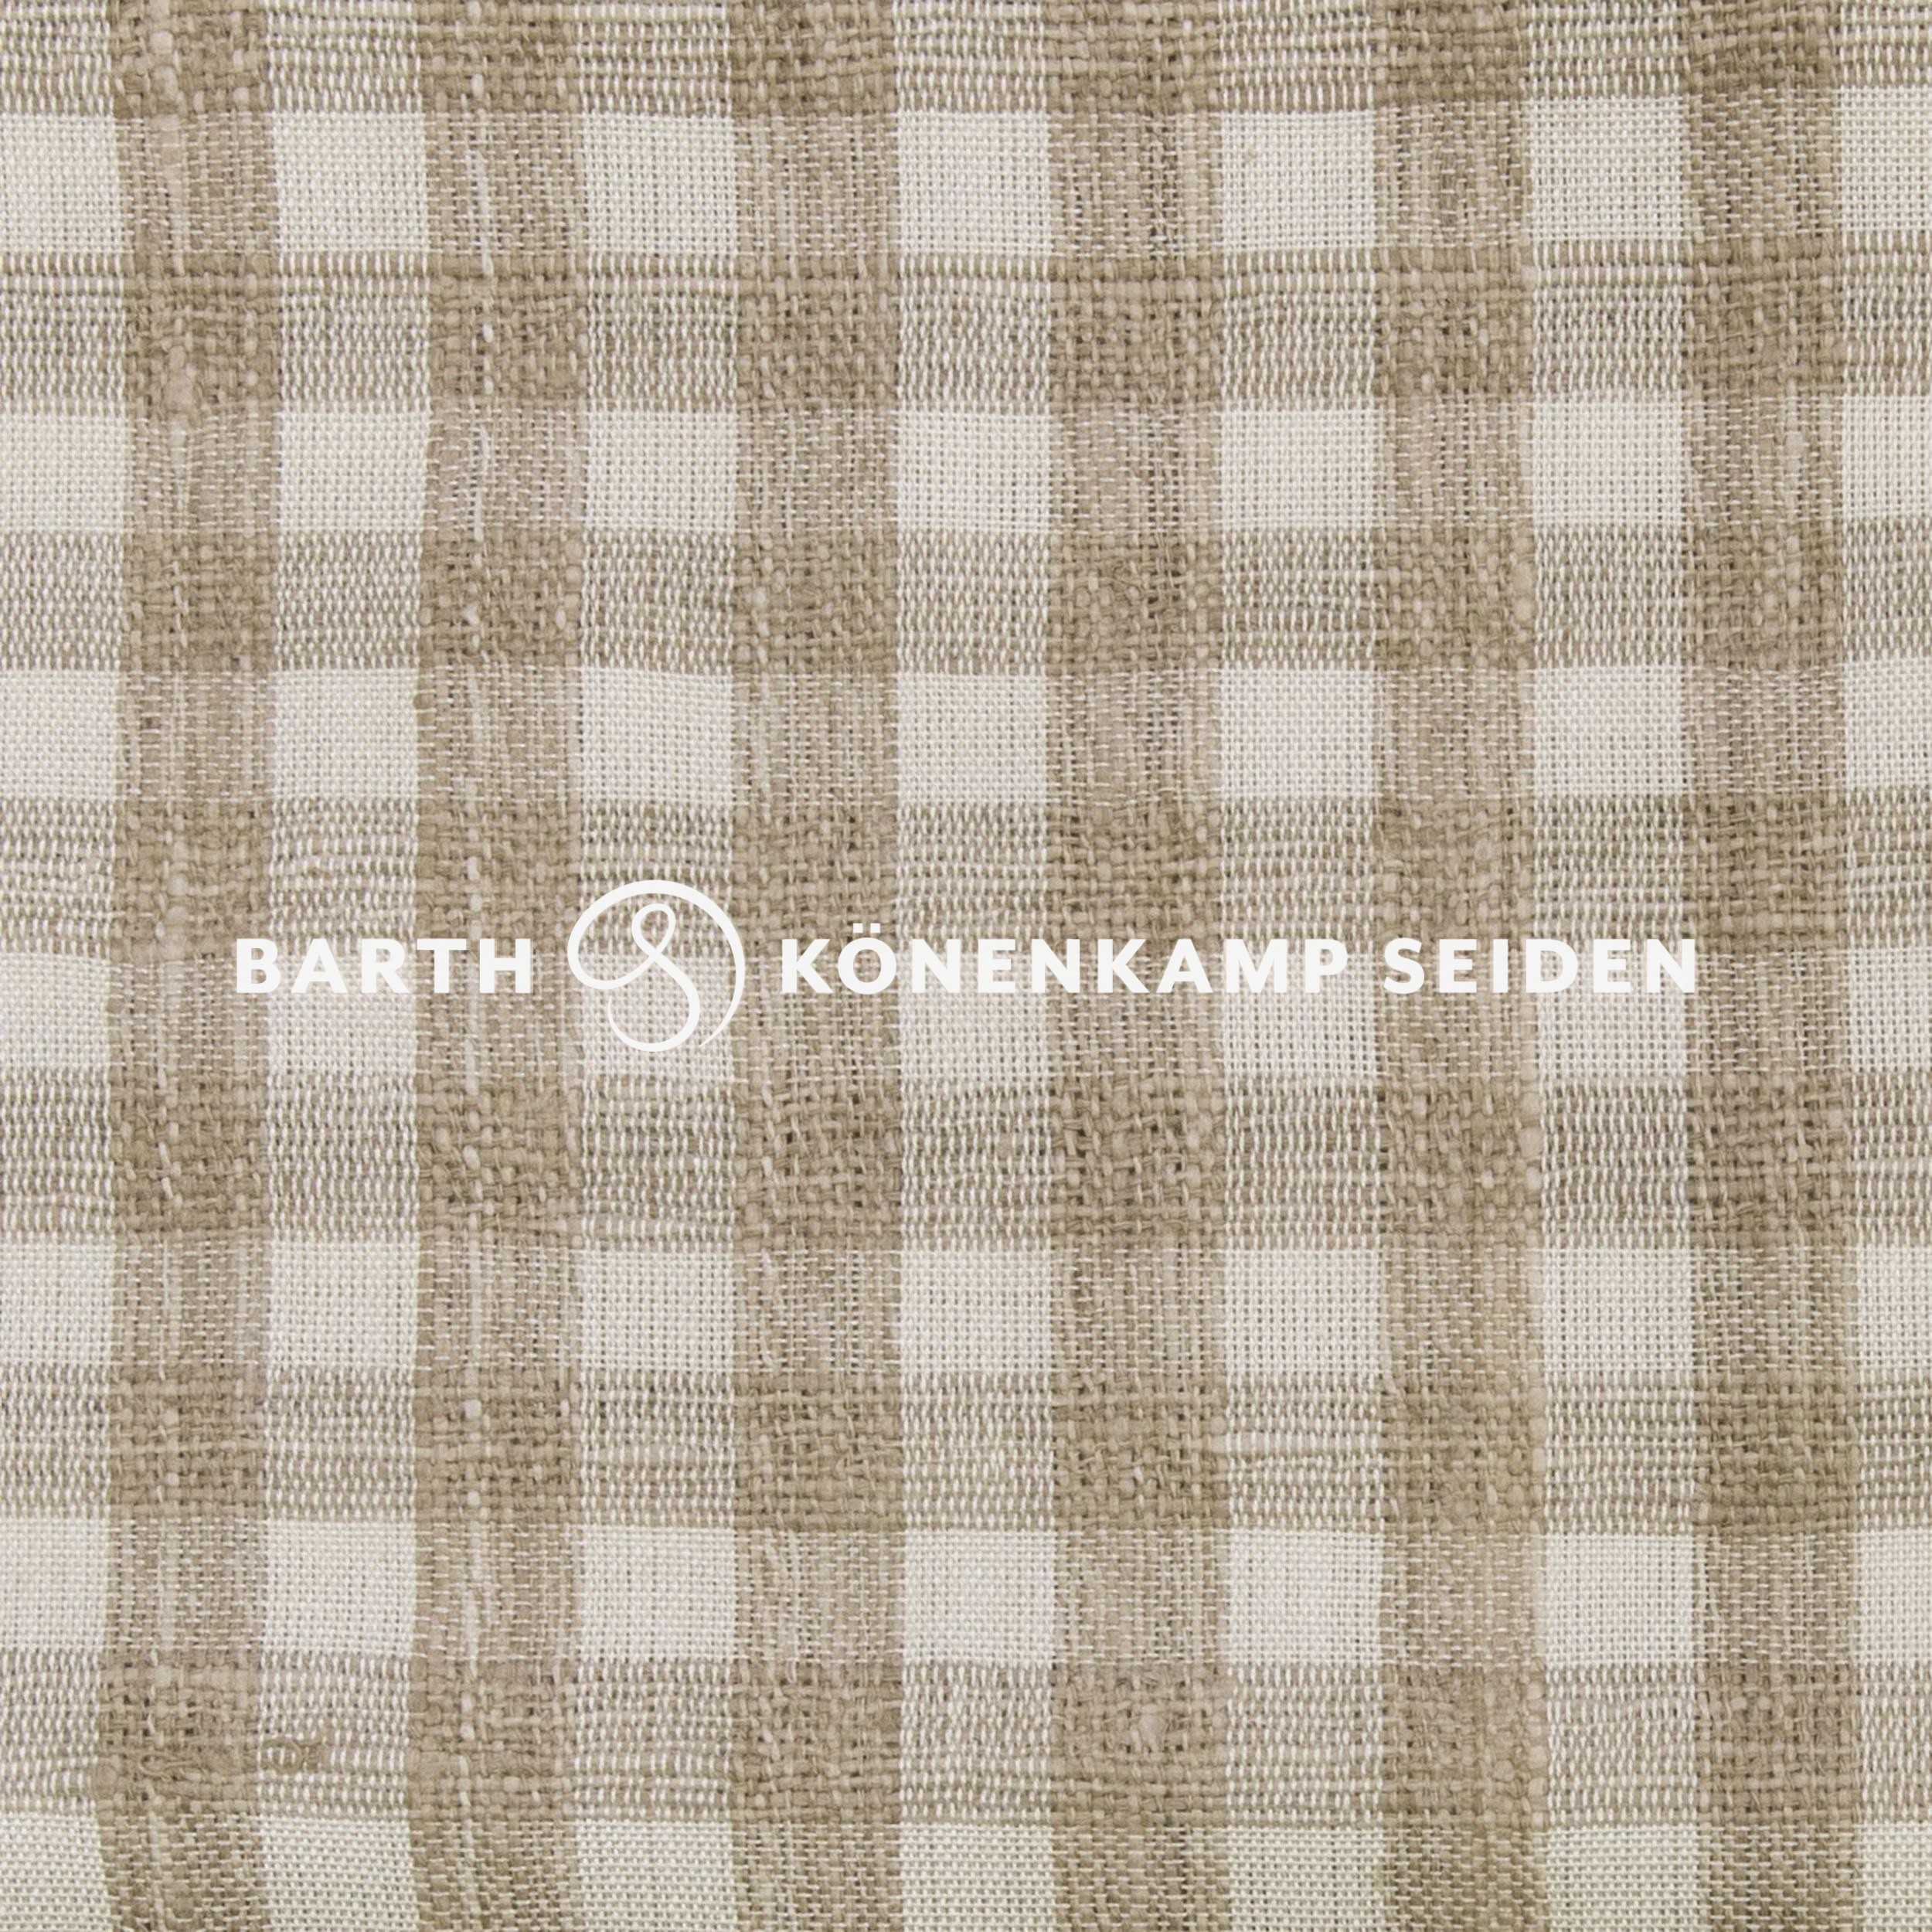 3063-3 / Chanda silk checked